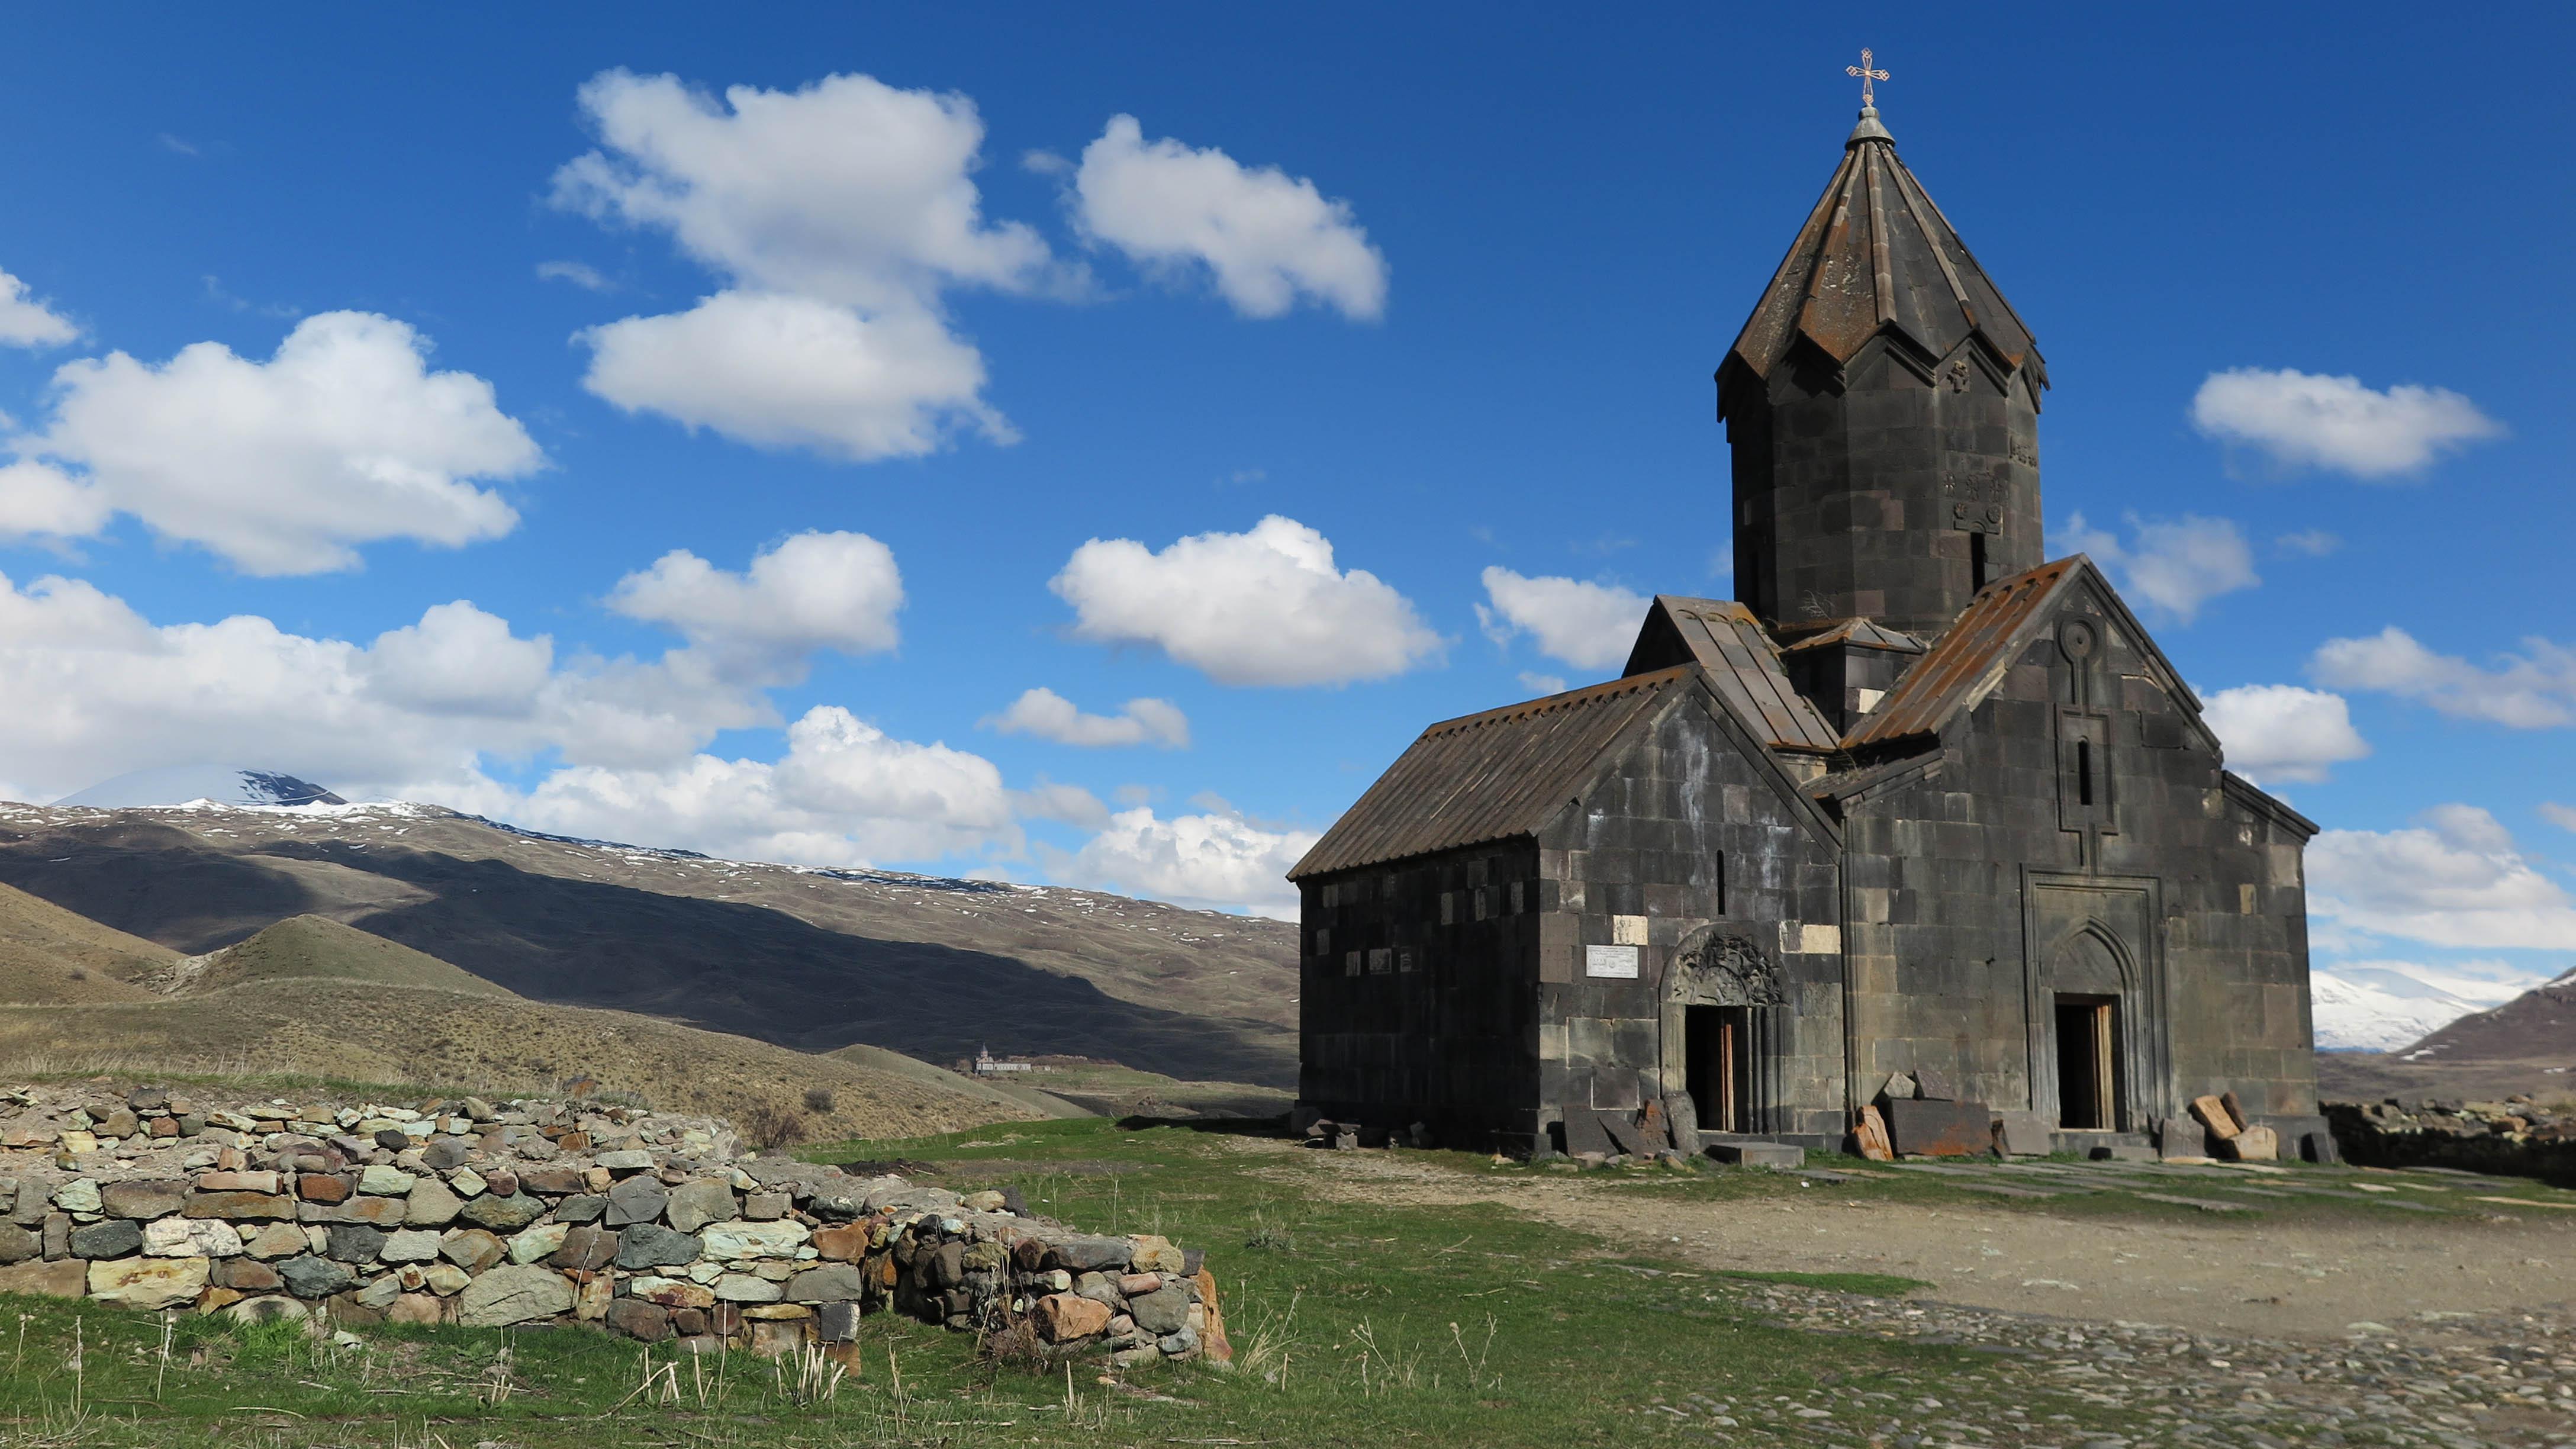 sviluppo ecoturismo in armenia